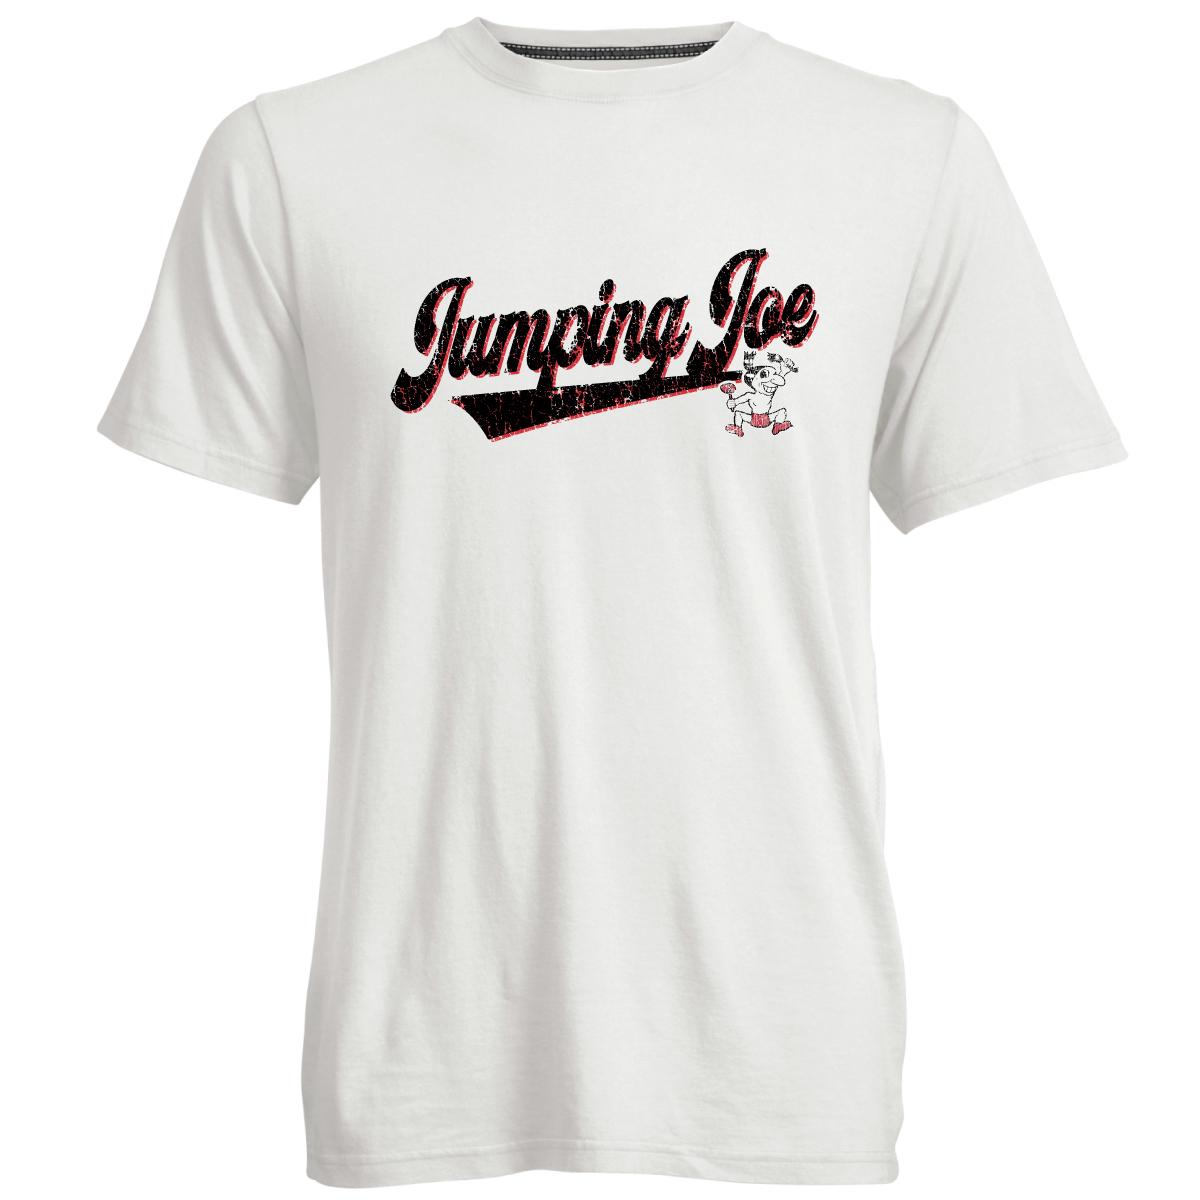 Jumping Joe GoTo Tee